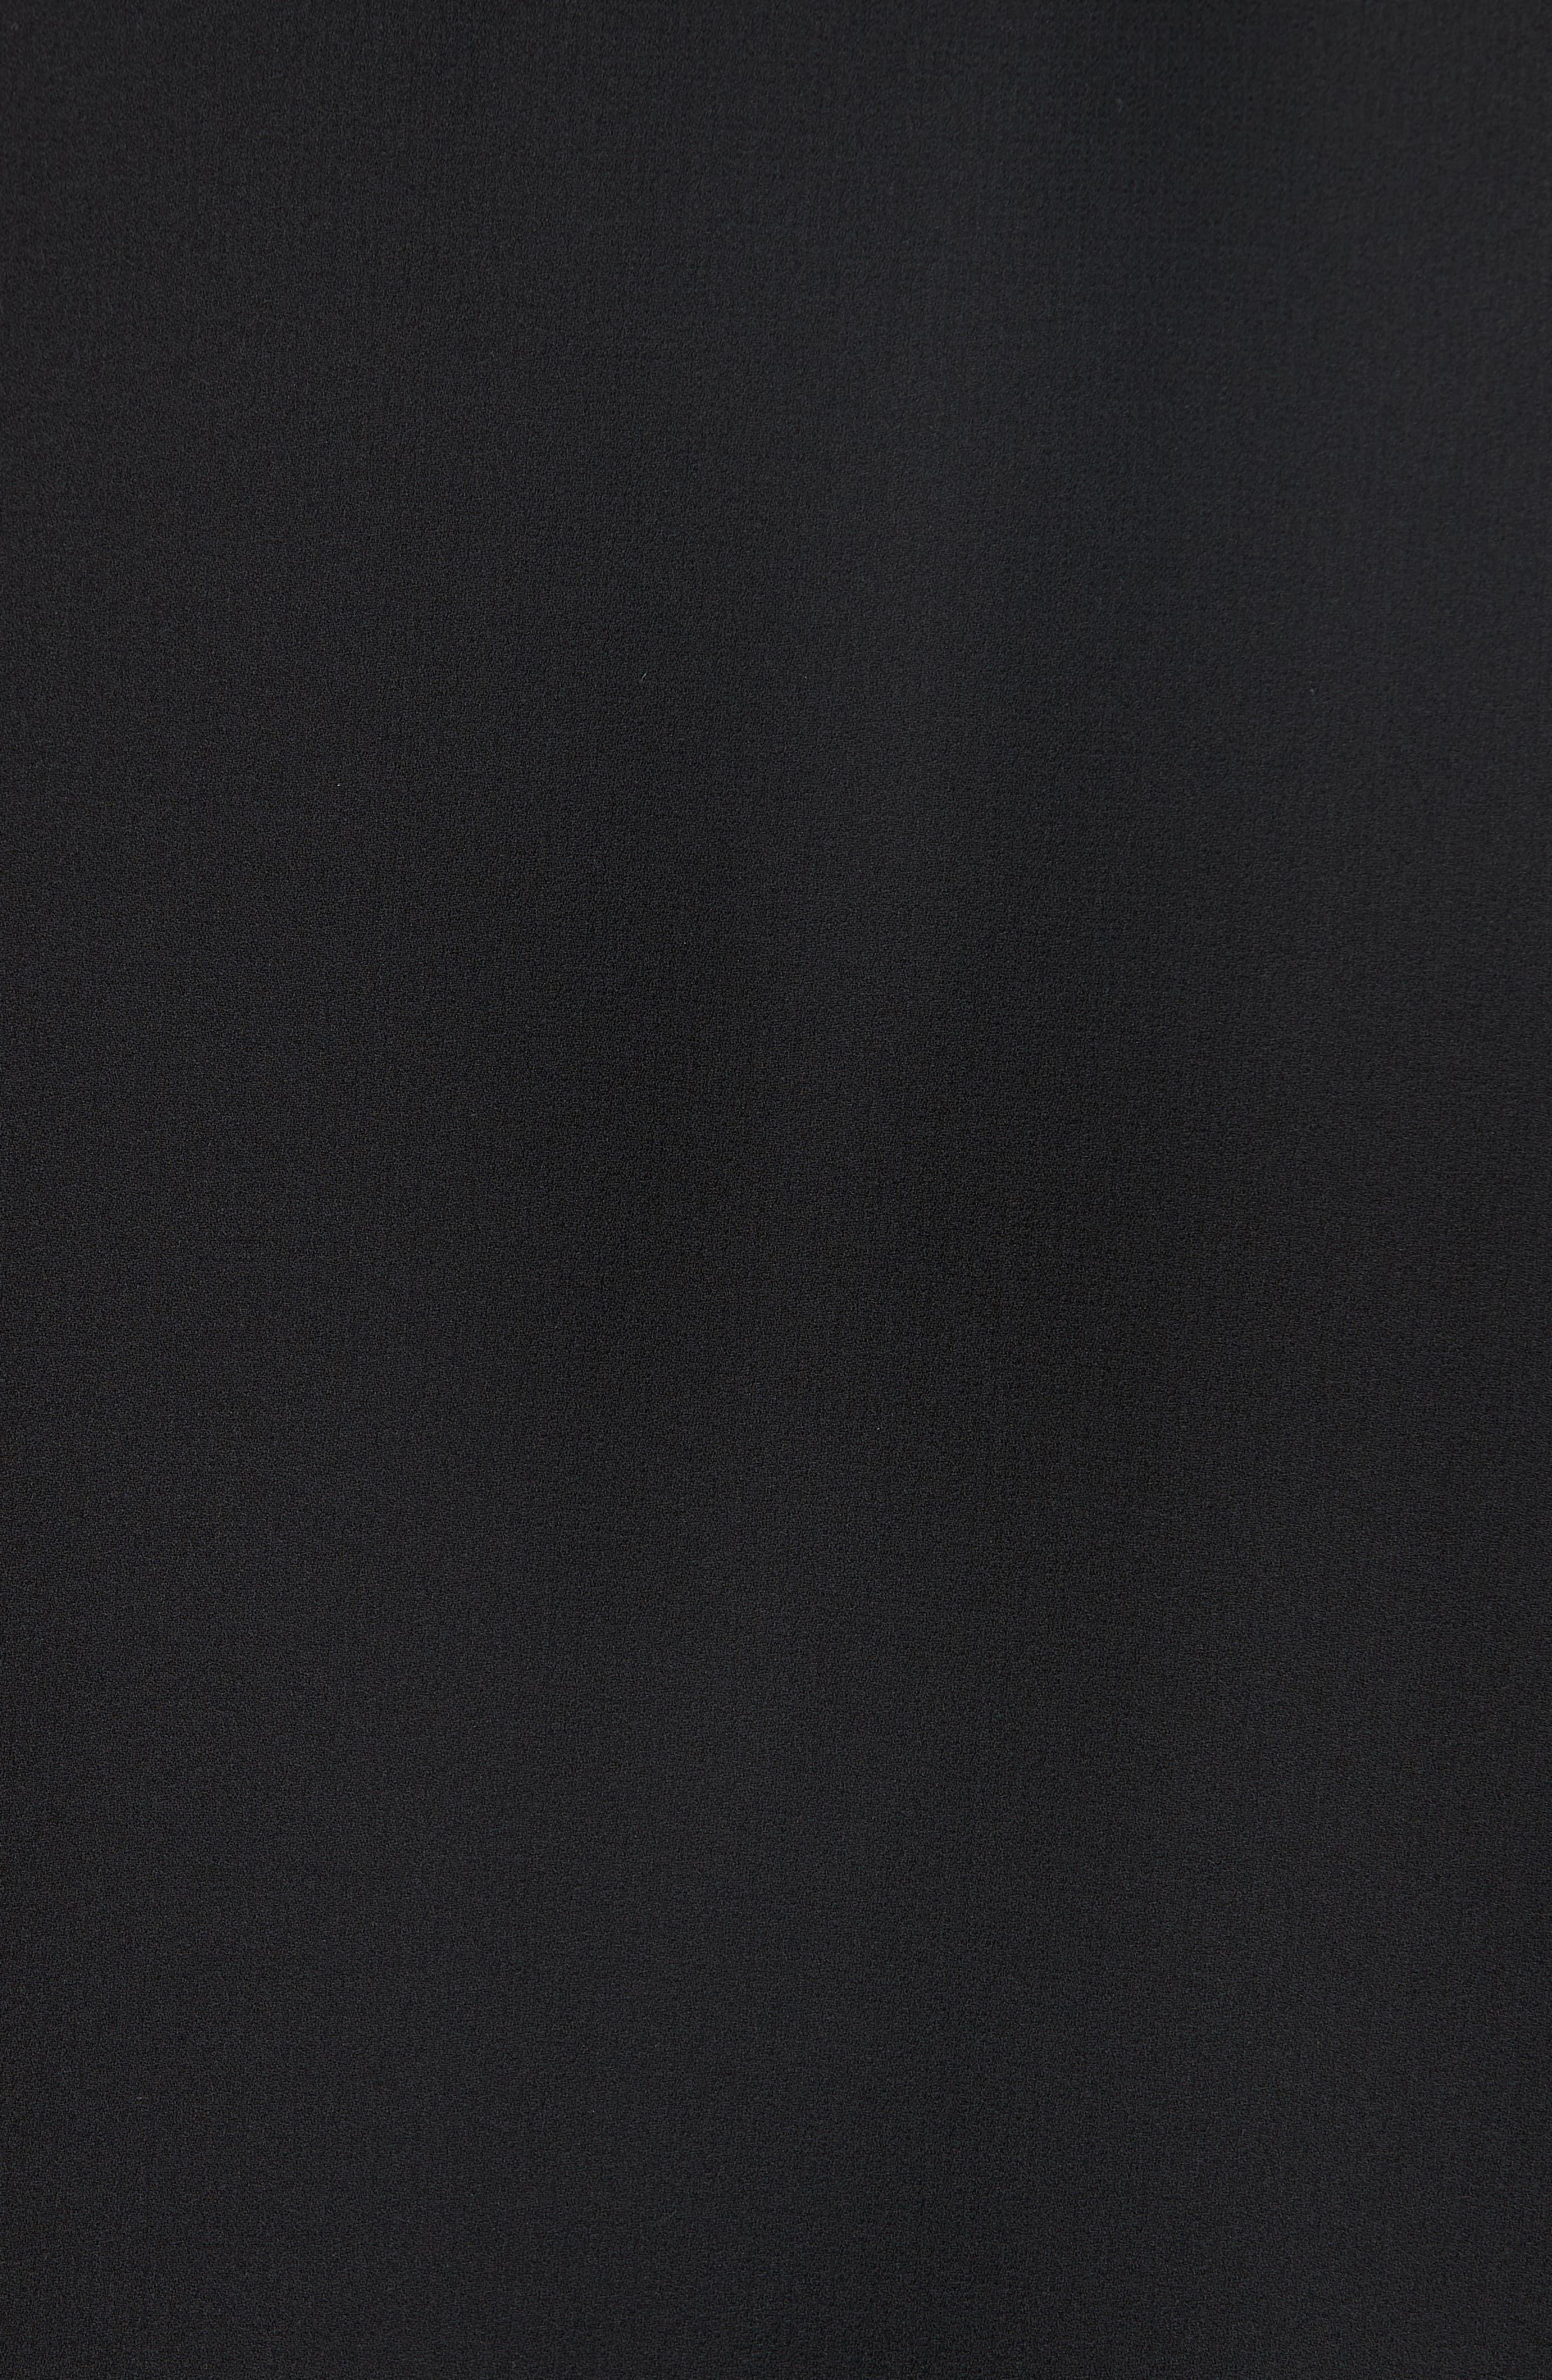 Slit Sleeve Silk Top,                             Alternate thumbnail 5, color,                             BLACK